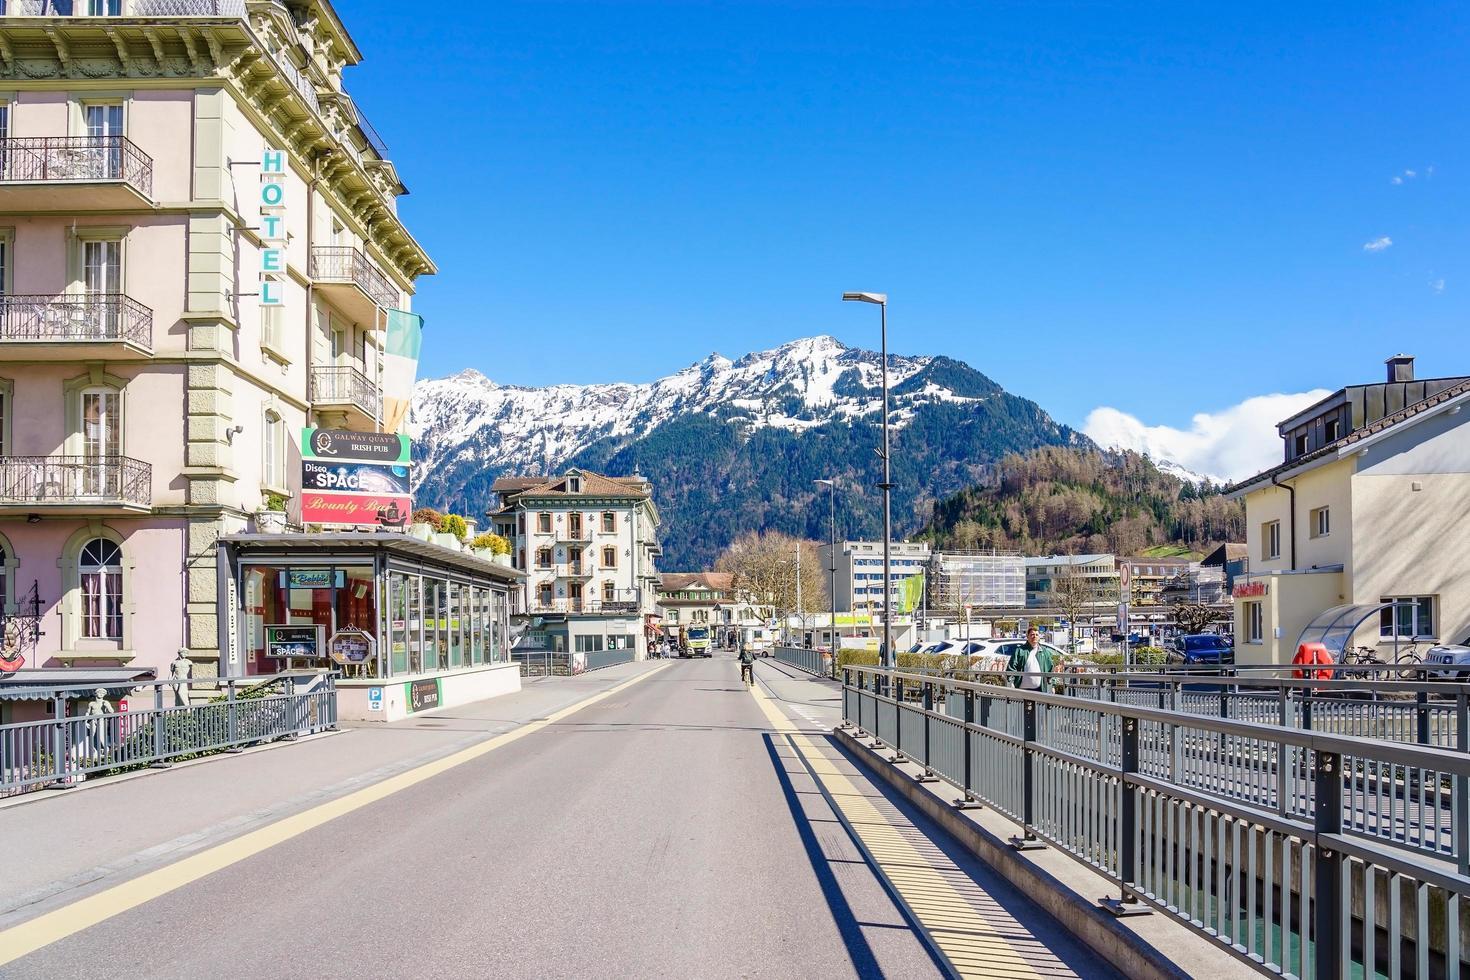 città vecchia di interlaken, svizzera, 2018 foto